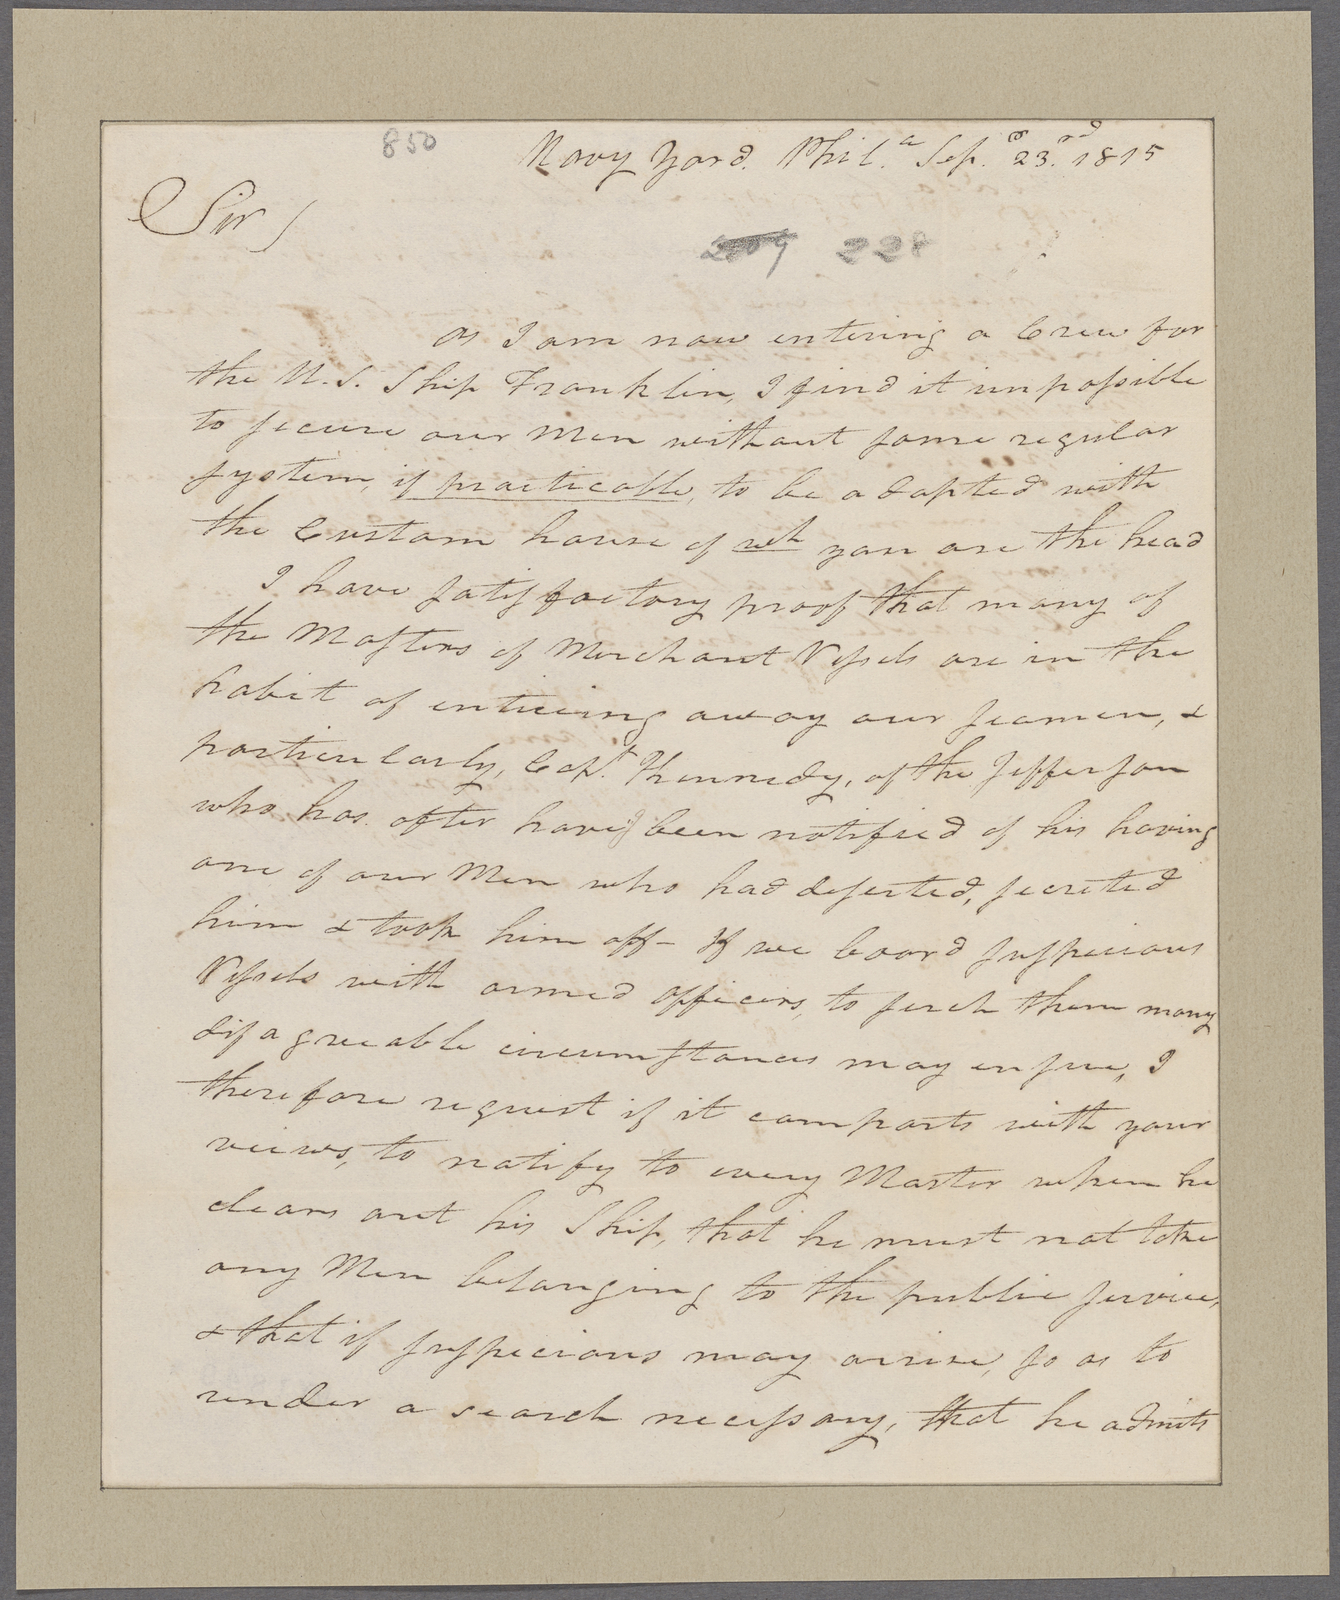 Murray, Alexander. Navy Yard, Philadelphia. To Gen. John Steele